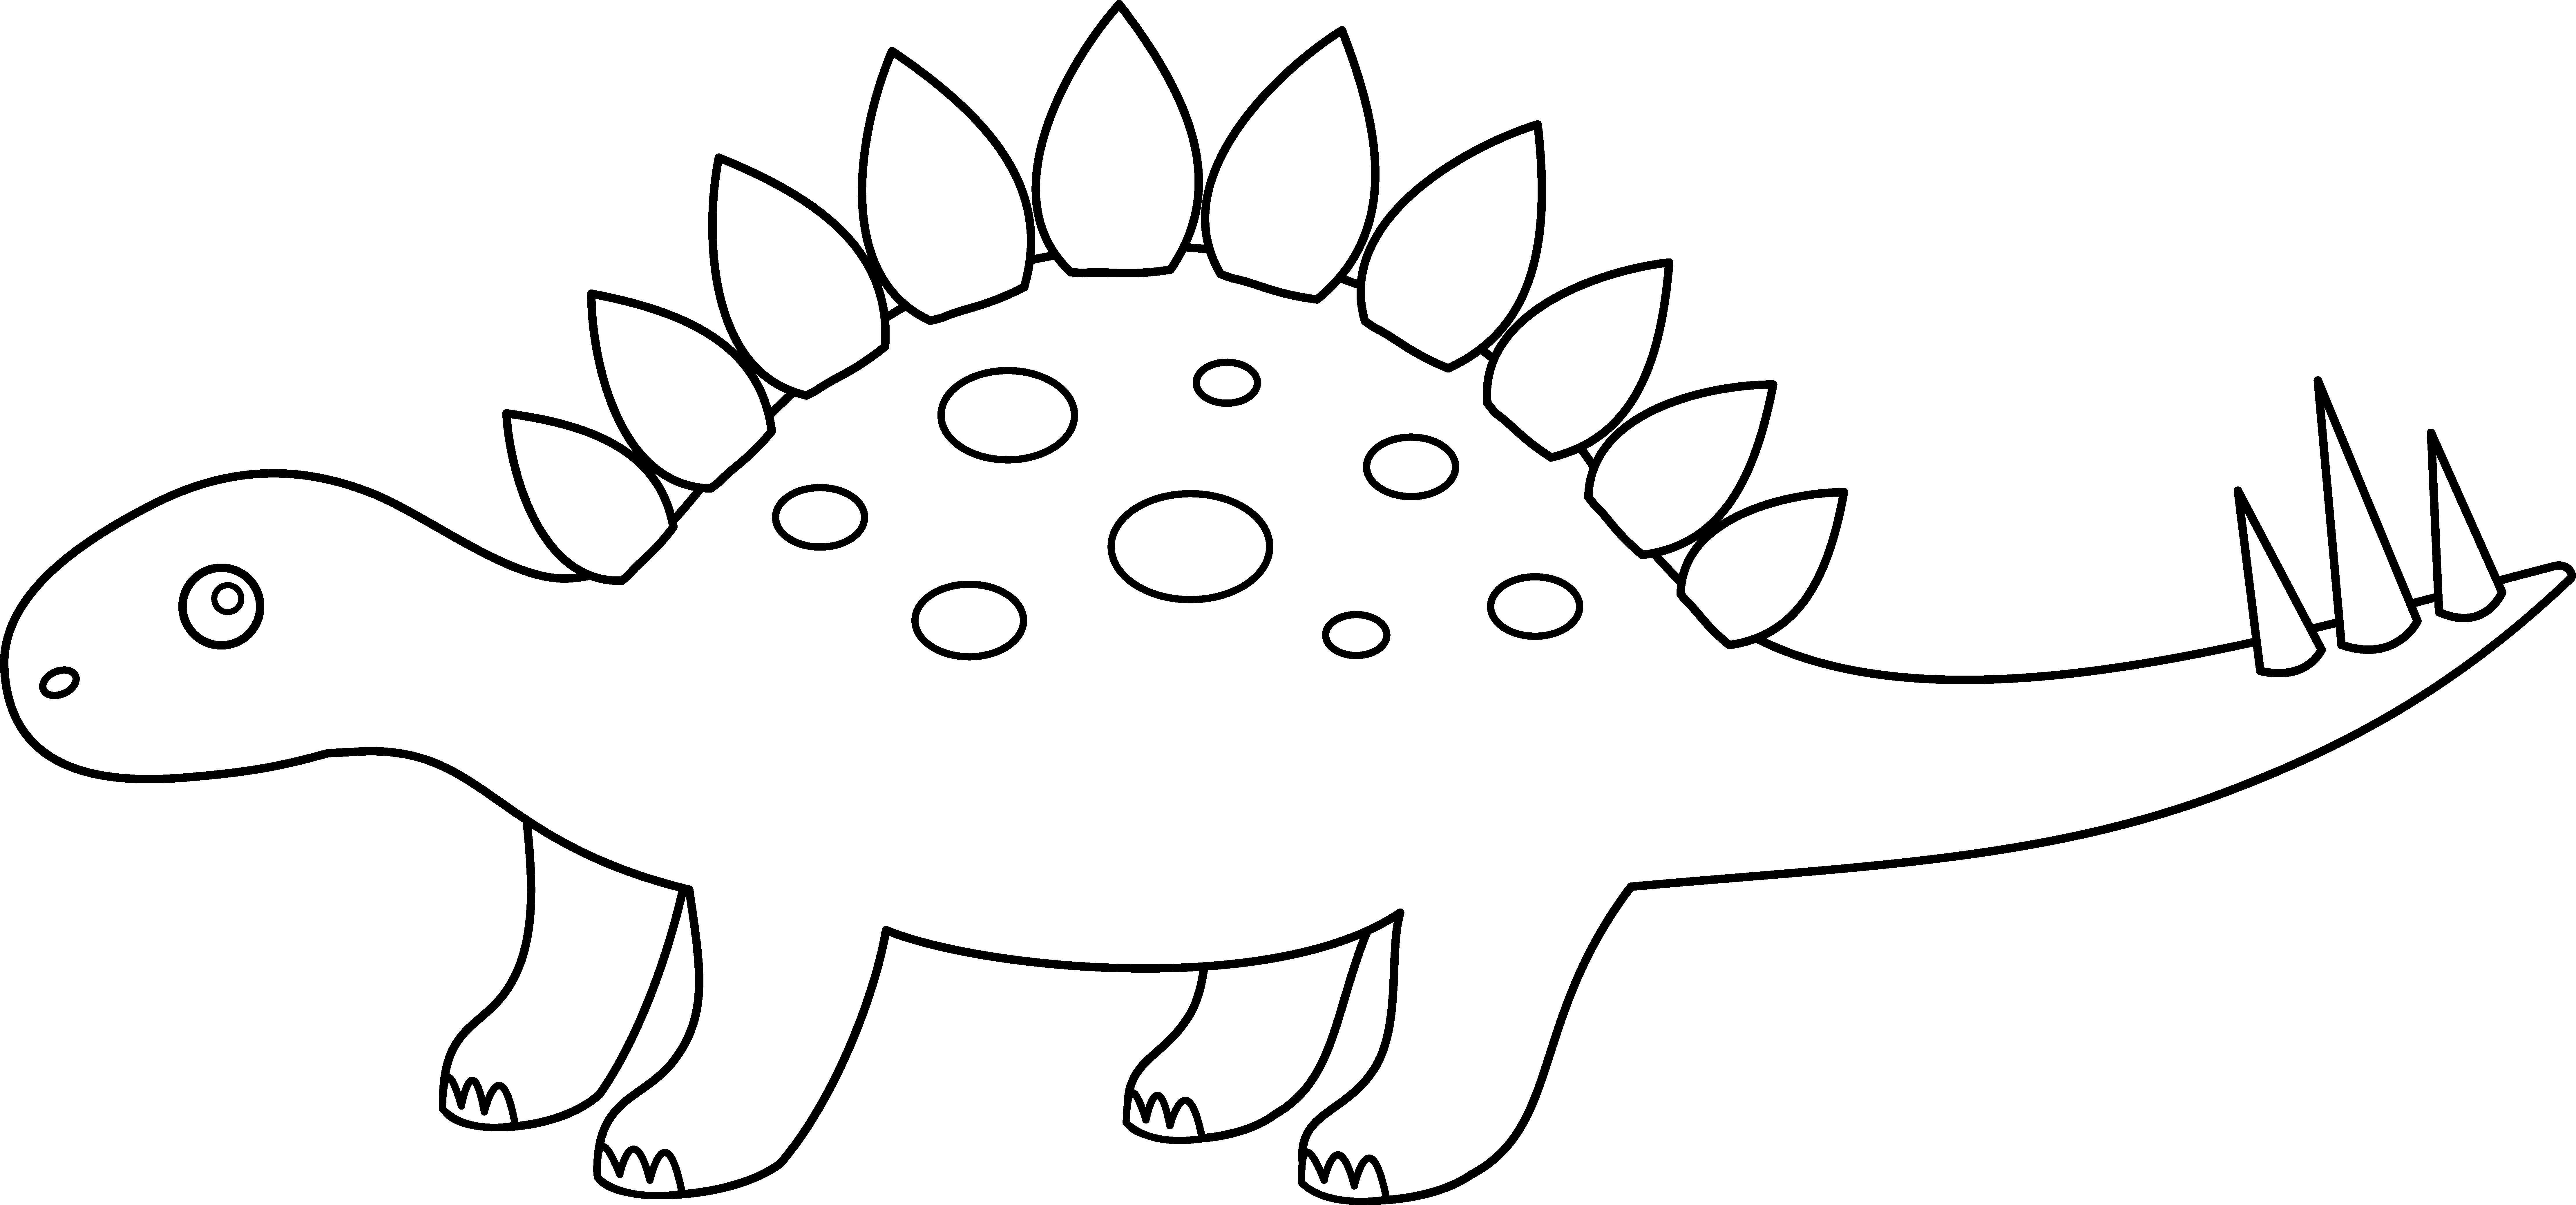 stegosaurus pictures stegosaurus dinosaur pictures pictures of stegosaurus stegosaurus pictures